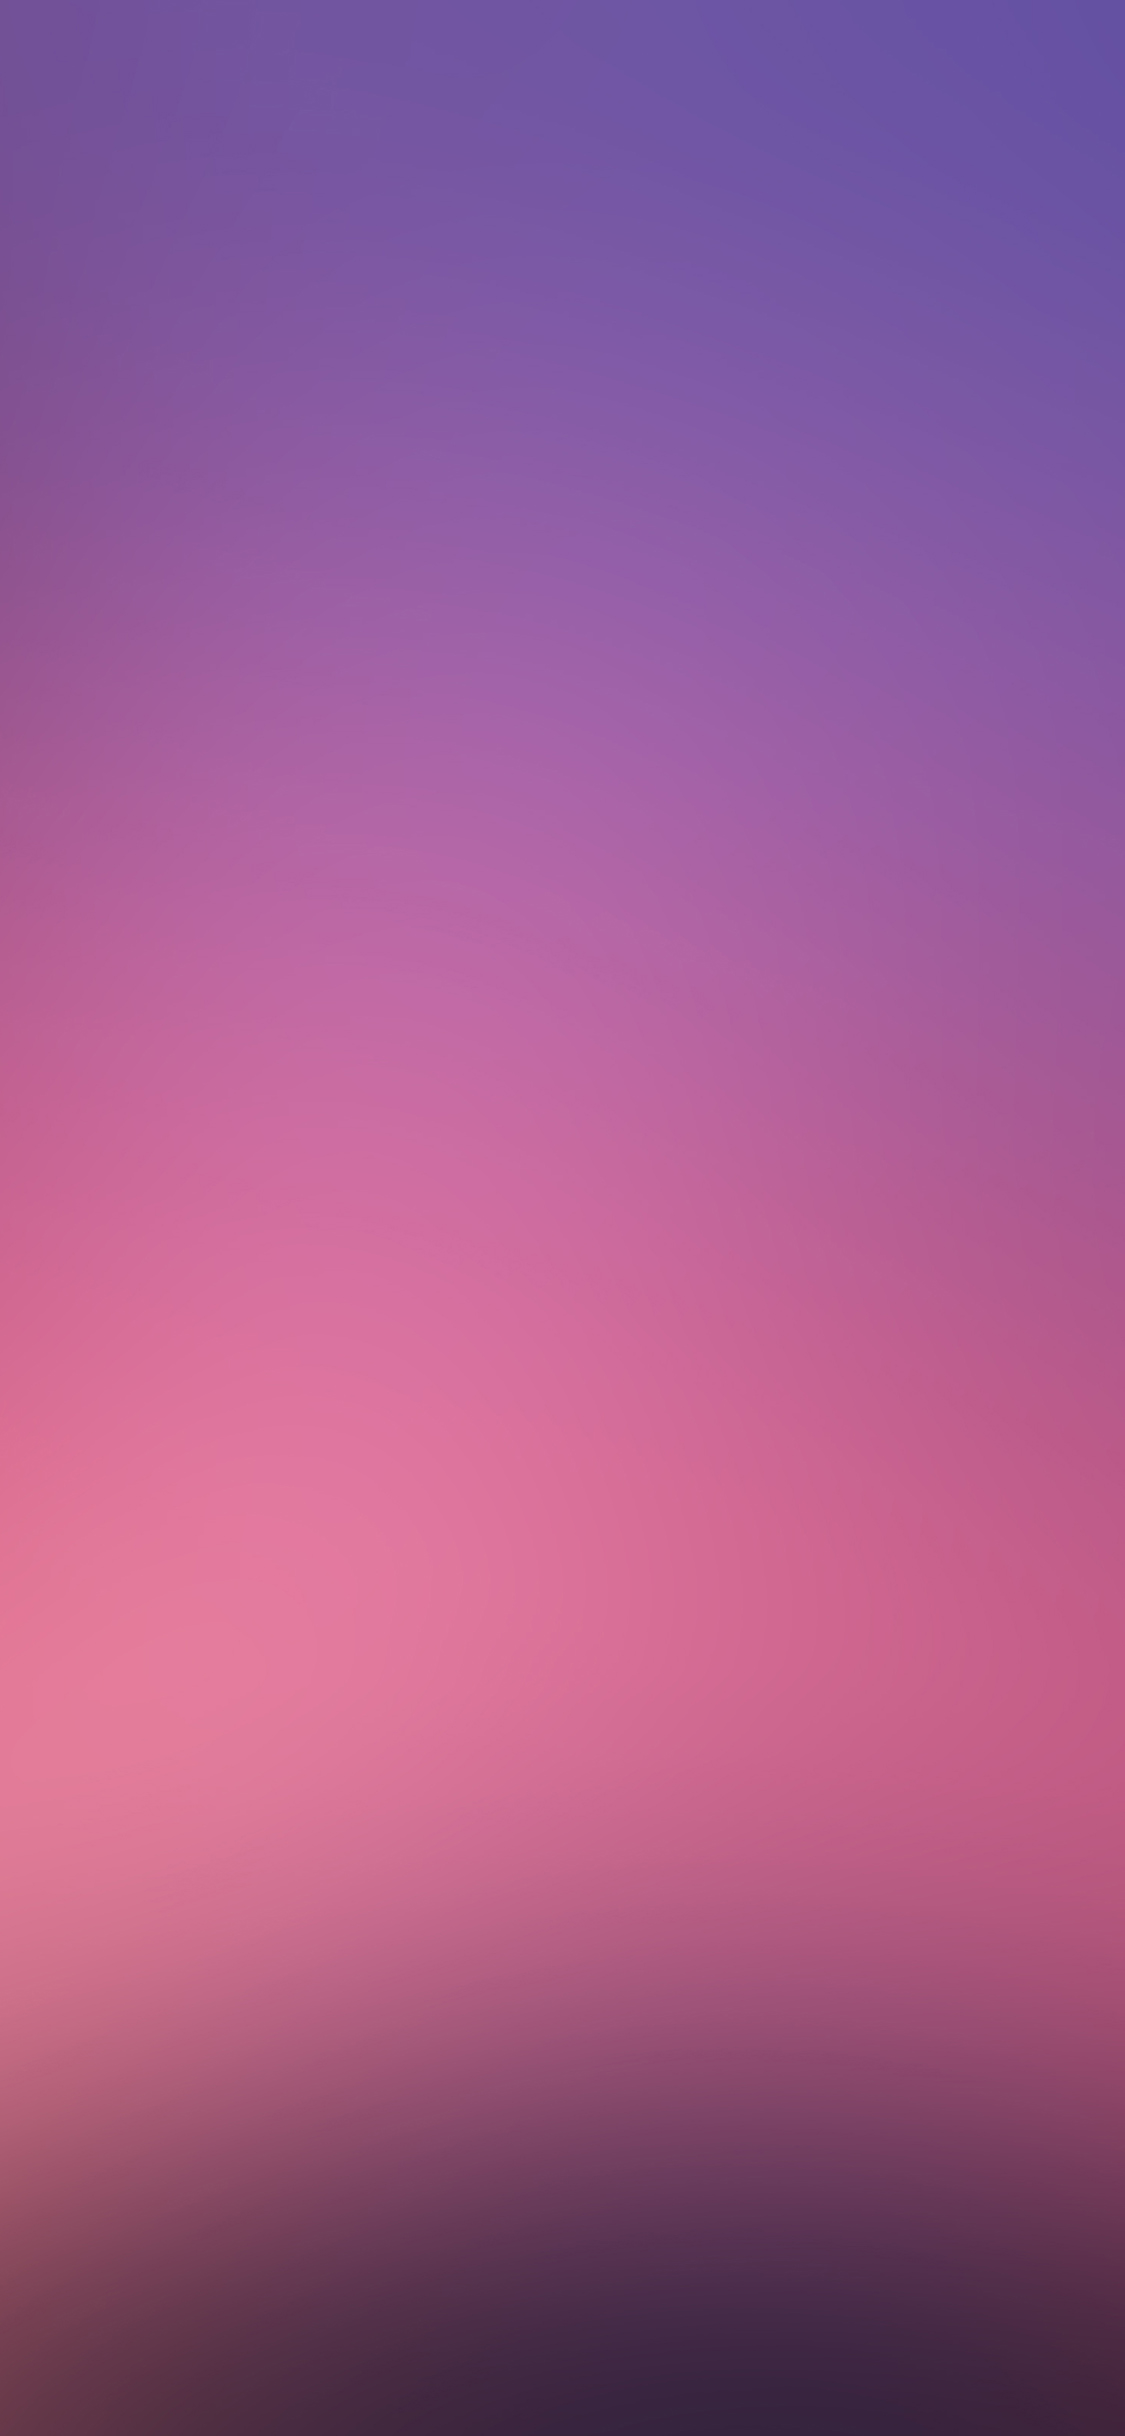 iPhoneXpapers.com-Apple-iPhone-wallpaper-sd53-purple-amargedon-gradation-blur